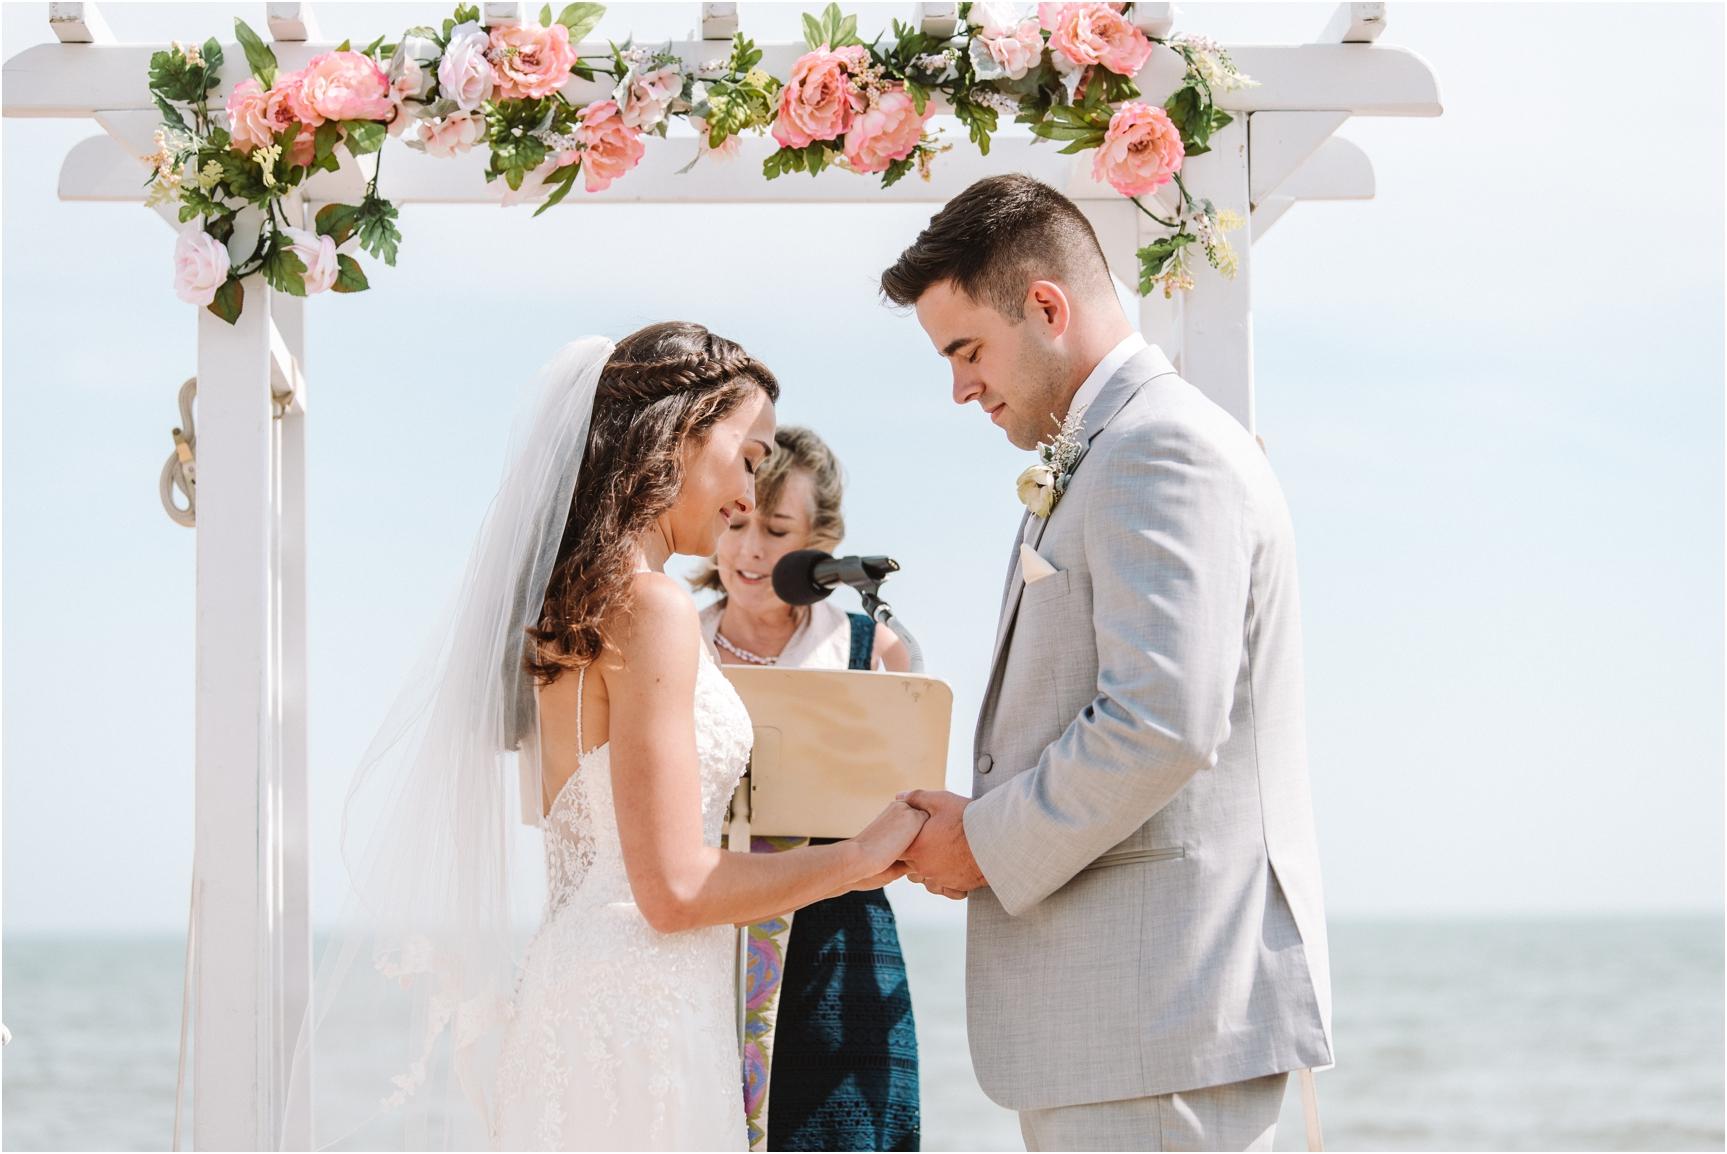 Sarah & Sam Pelham House Cape Cod Wedding Photographer-109.jpg